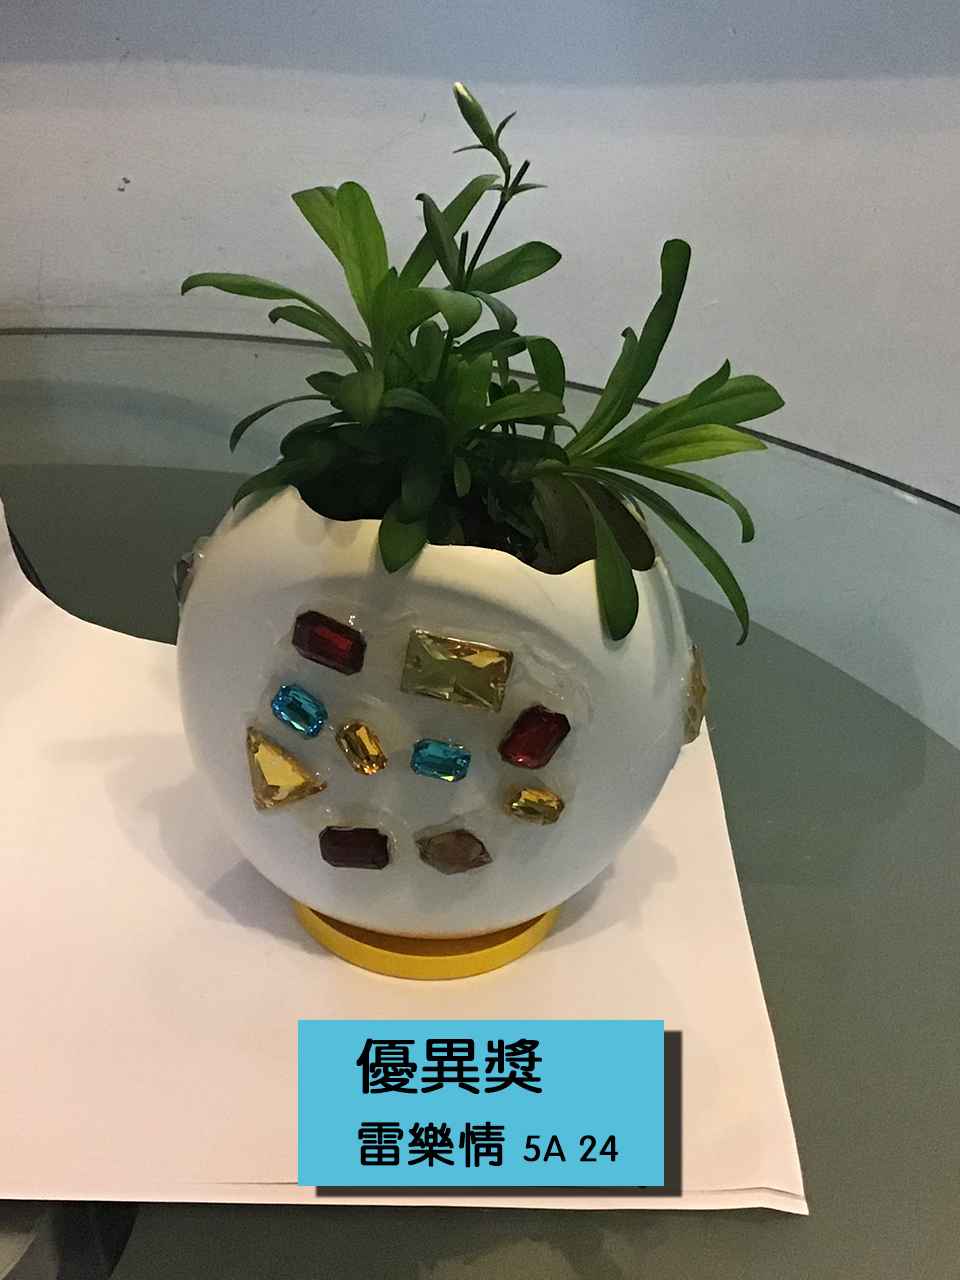 https://plkcjy.edu.hk/sites/default/files/you_yi_jiang_5a_24_lei_le_qing_.jpg